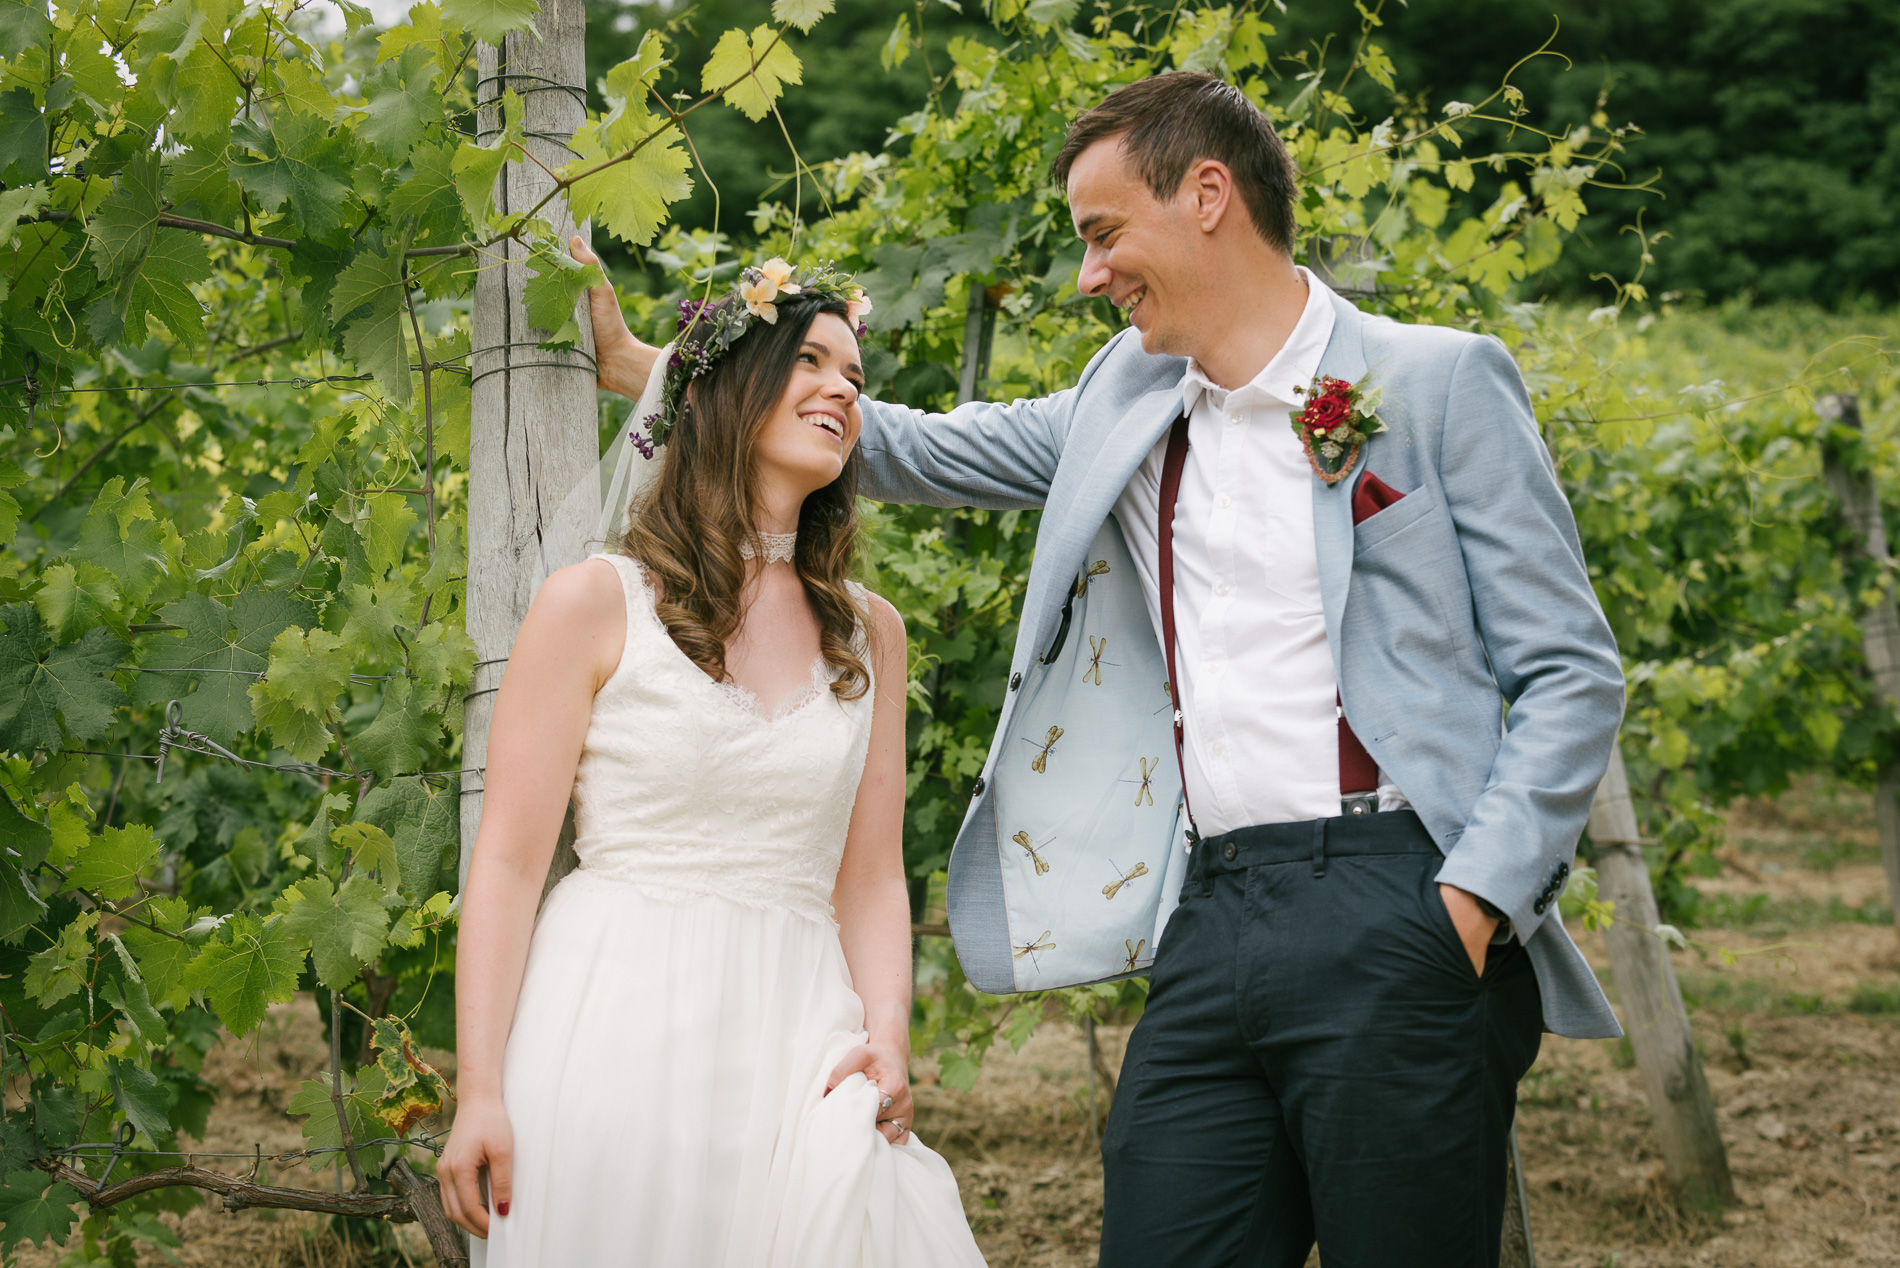 wedding-langhe-alba-italy4